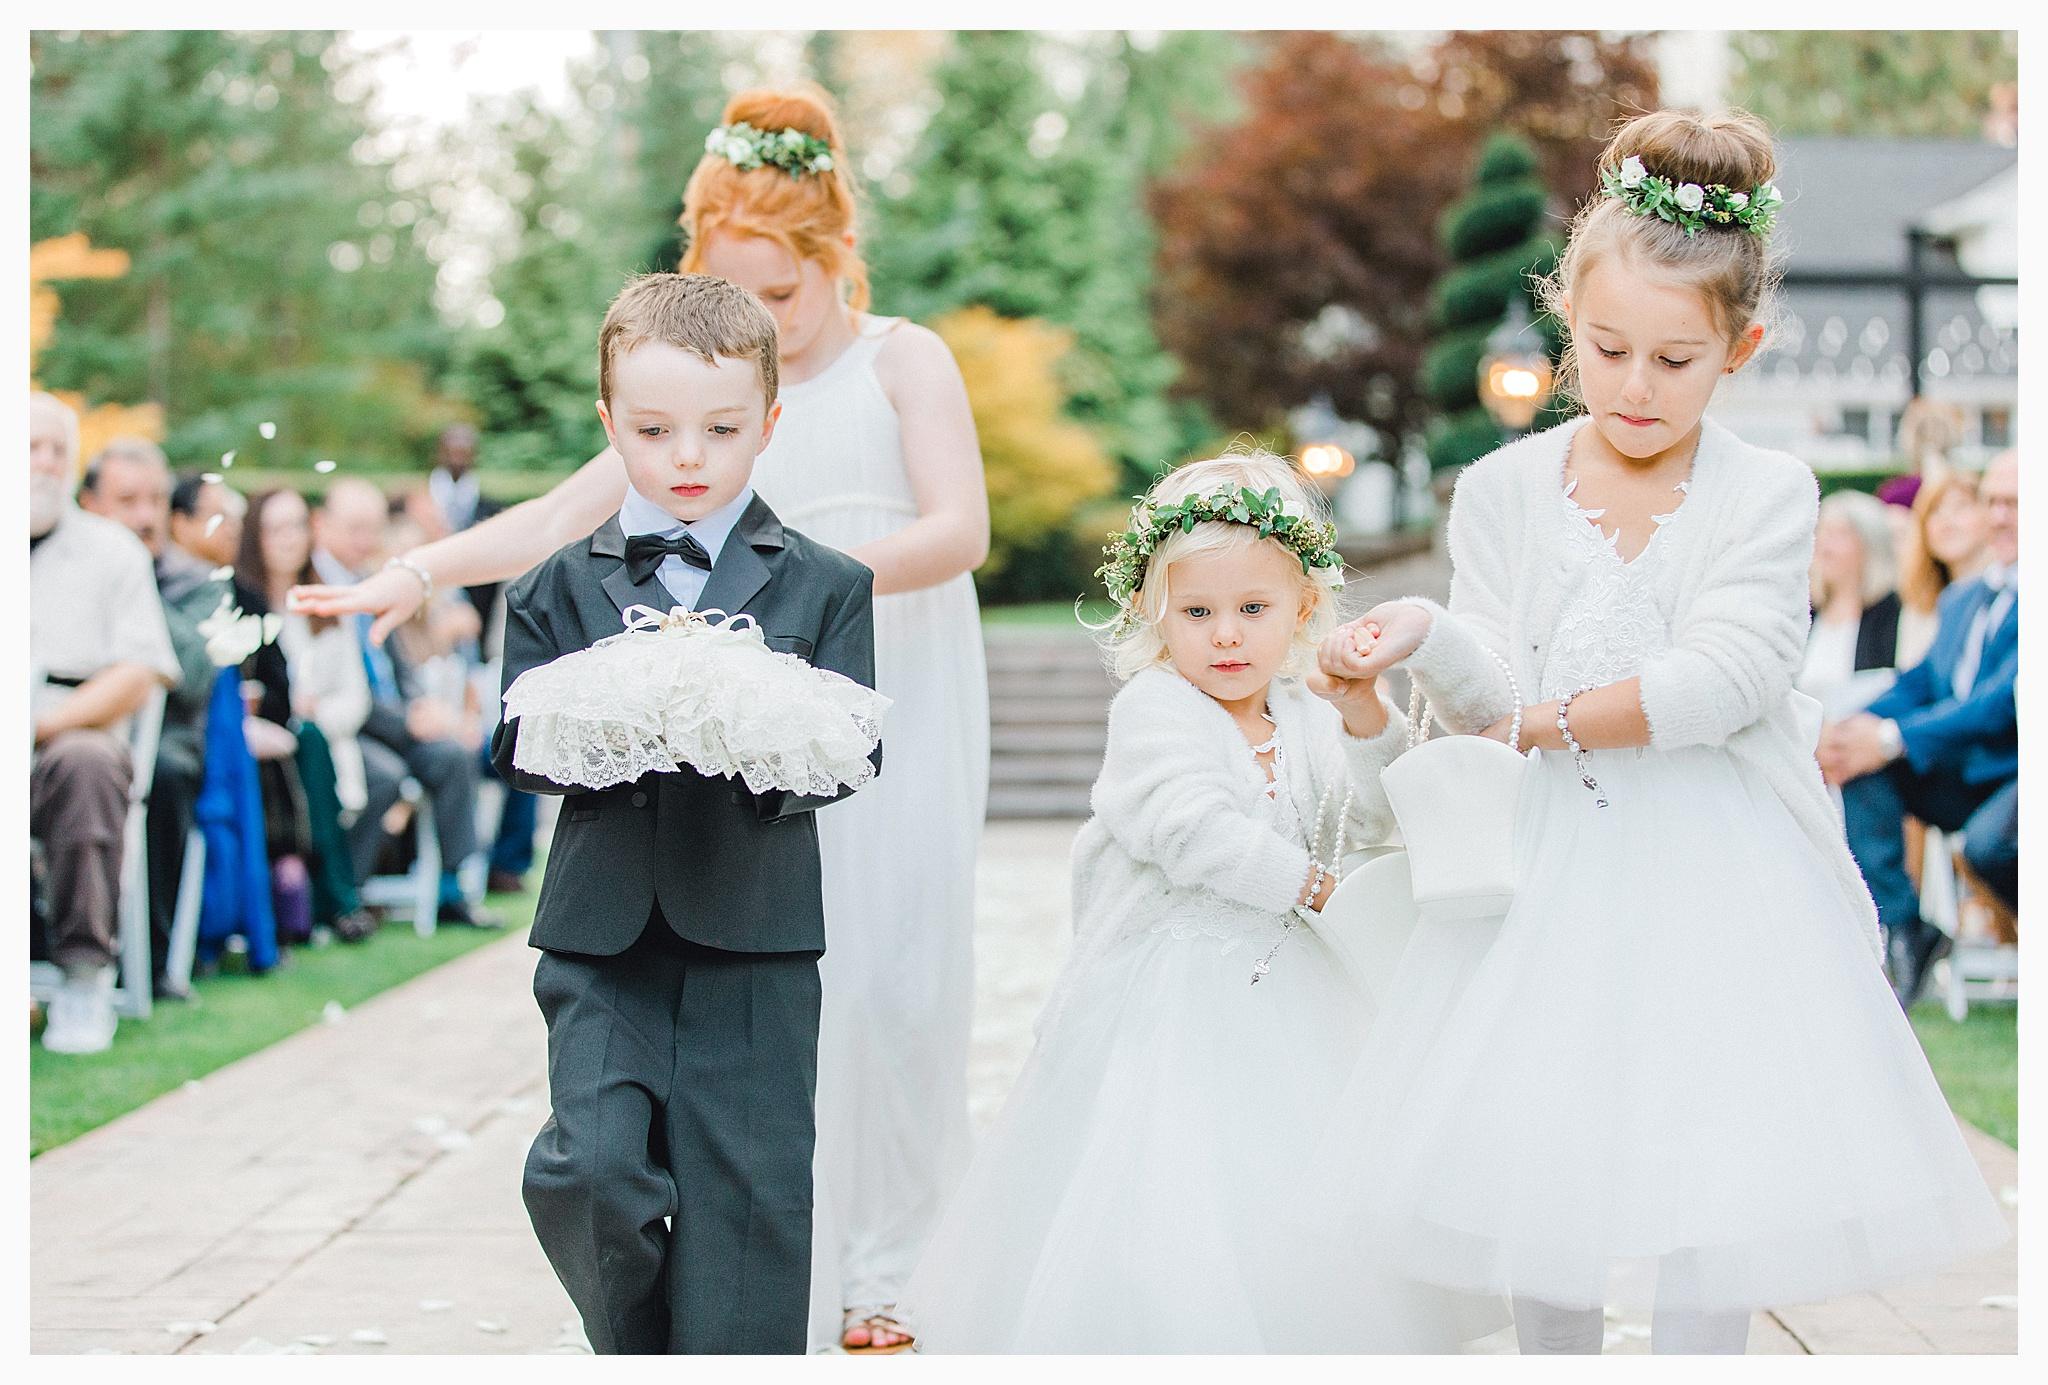 Emma Rose Company Light and Airy Wedding Photographer, Beautiful fall wedding at Rock Creek Gardens Venue in Puyallup, Washington._0075.jpg